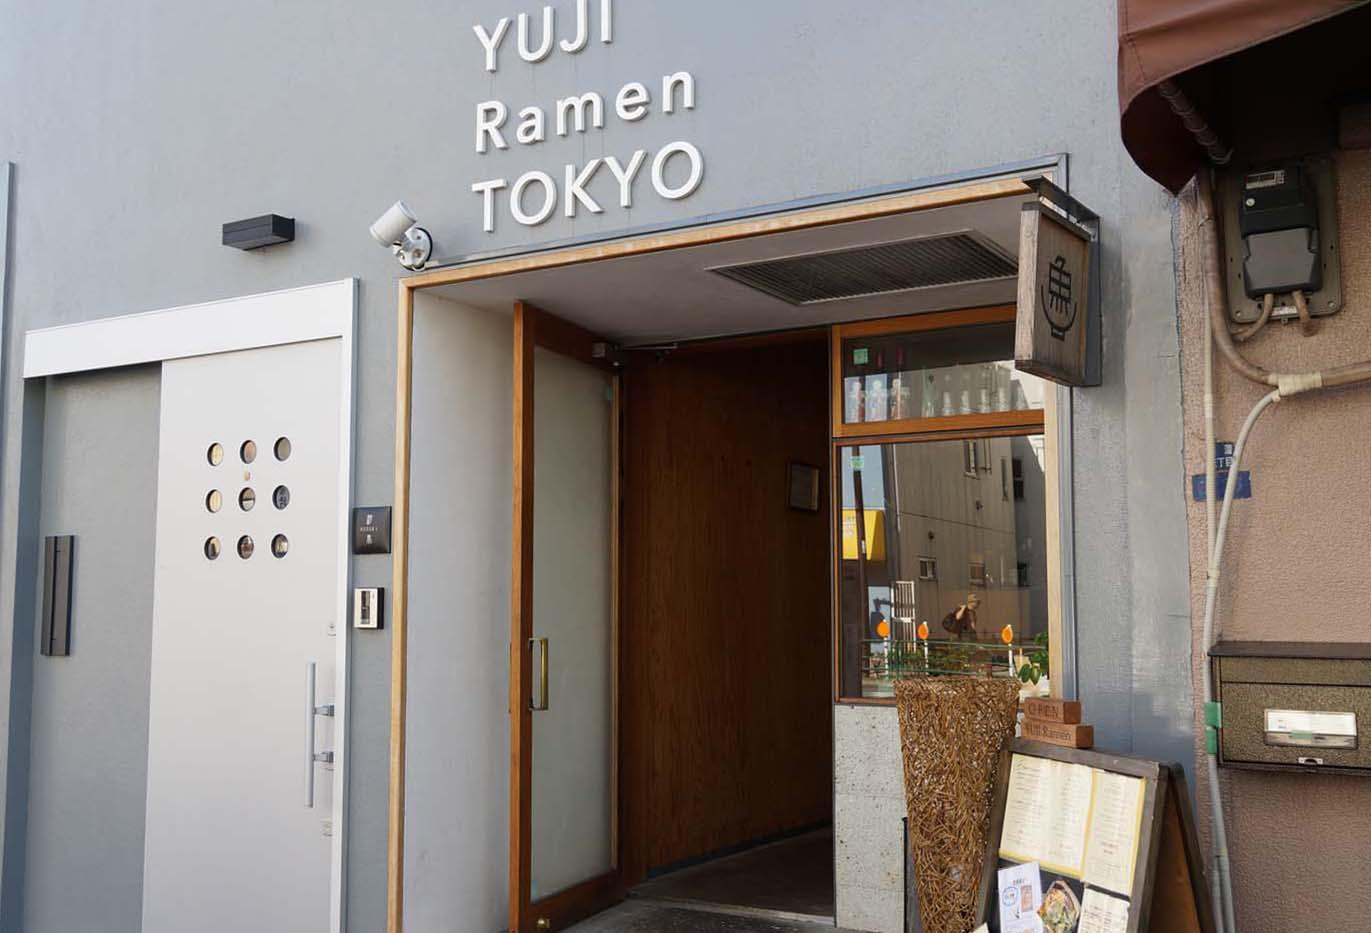 YUJI Ramen TOKYO(ユウジ ラーメン トーキョー)